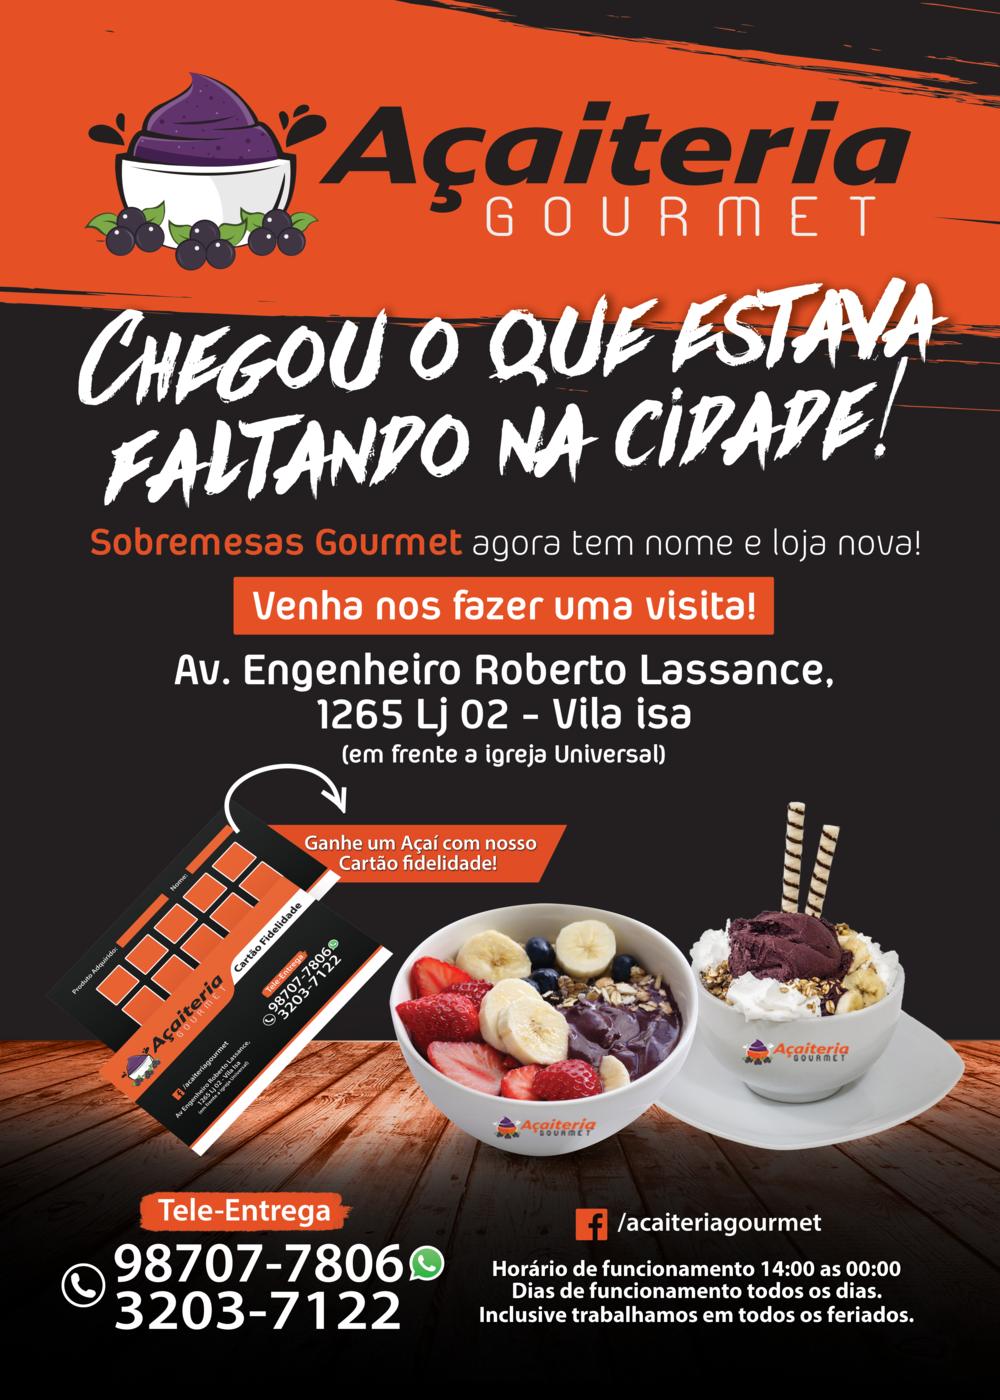 Acaiteria-Gourmet-Panfleto.png